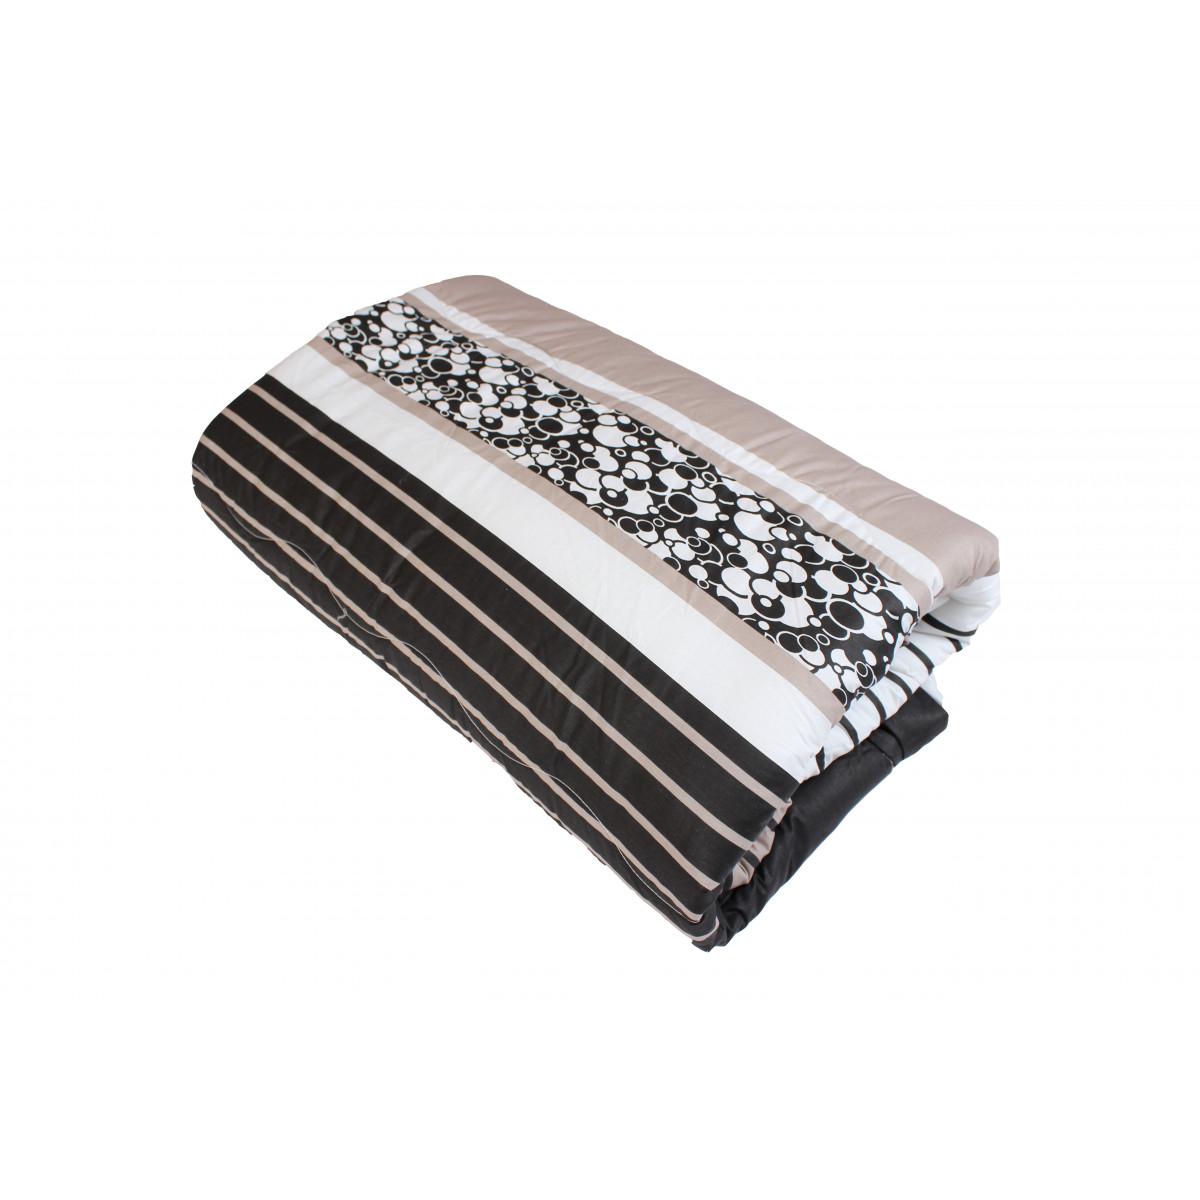 Пролетна завивка - 100% памук ранфорс - 200/210 - 150гр/м2 - Стило